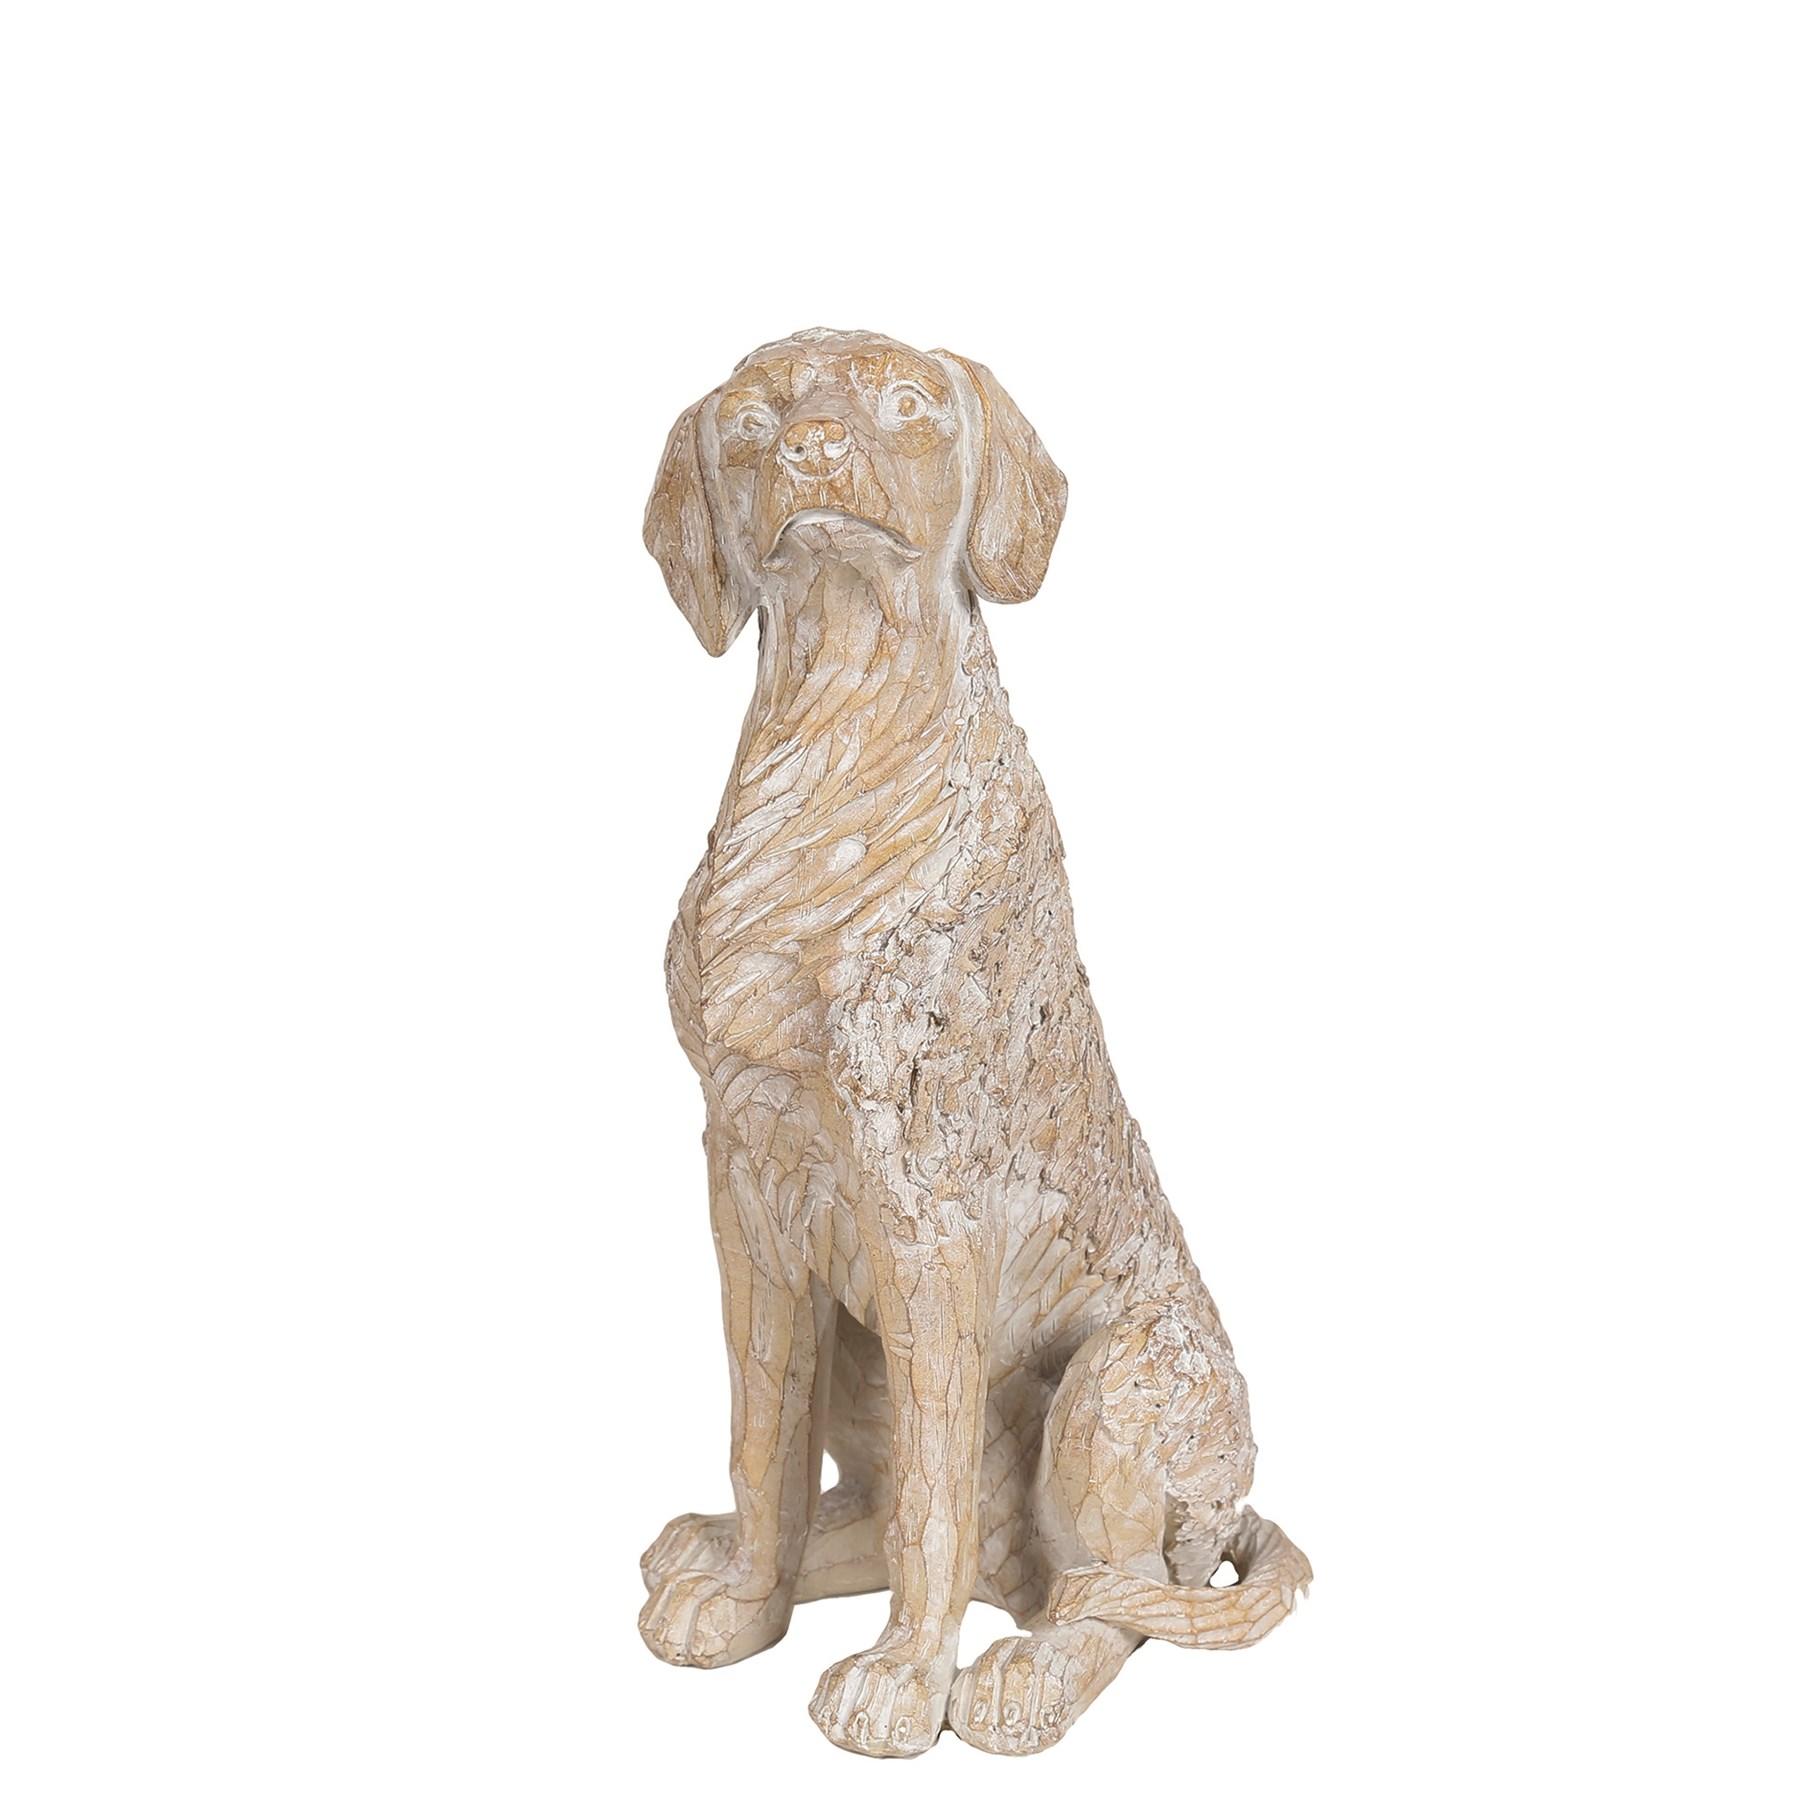 Decorative Etched Dog 28.5cm